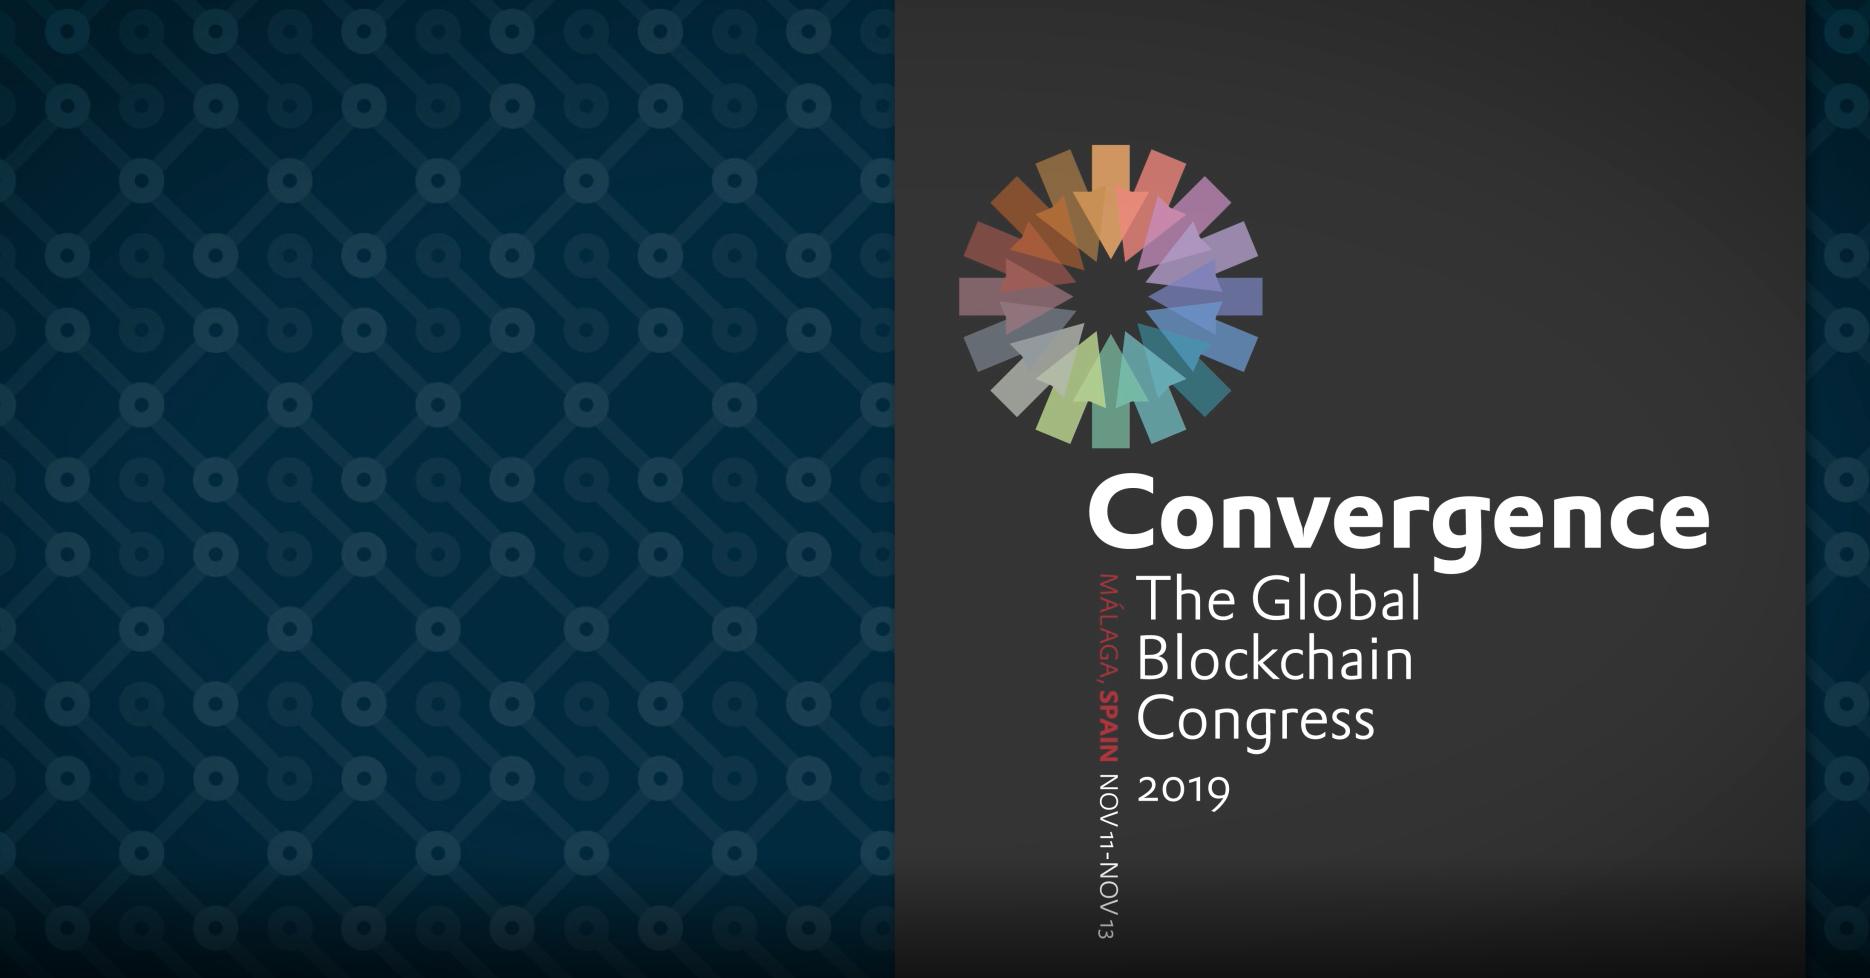 blockchain convergence